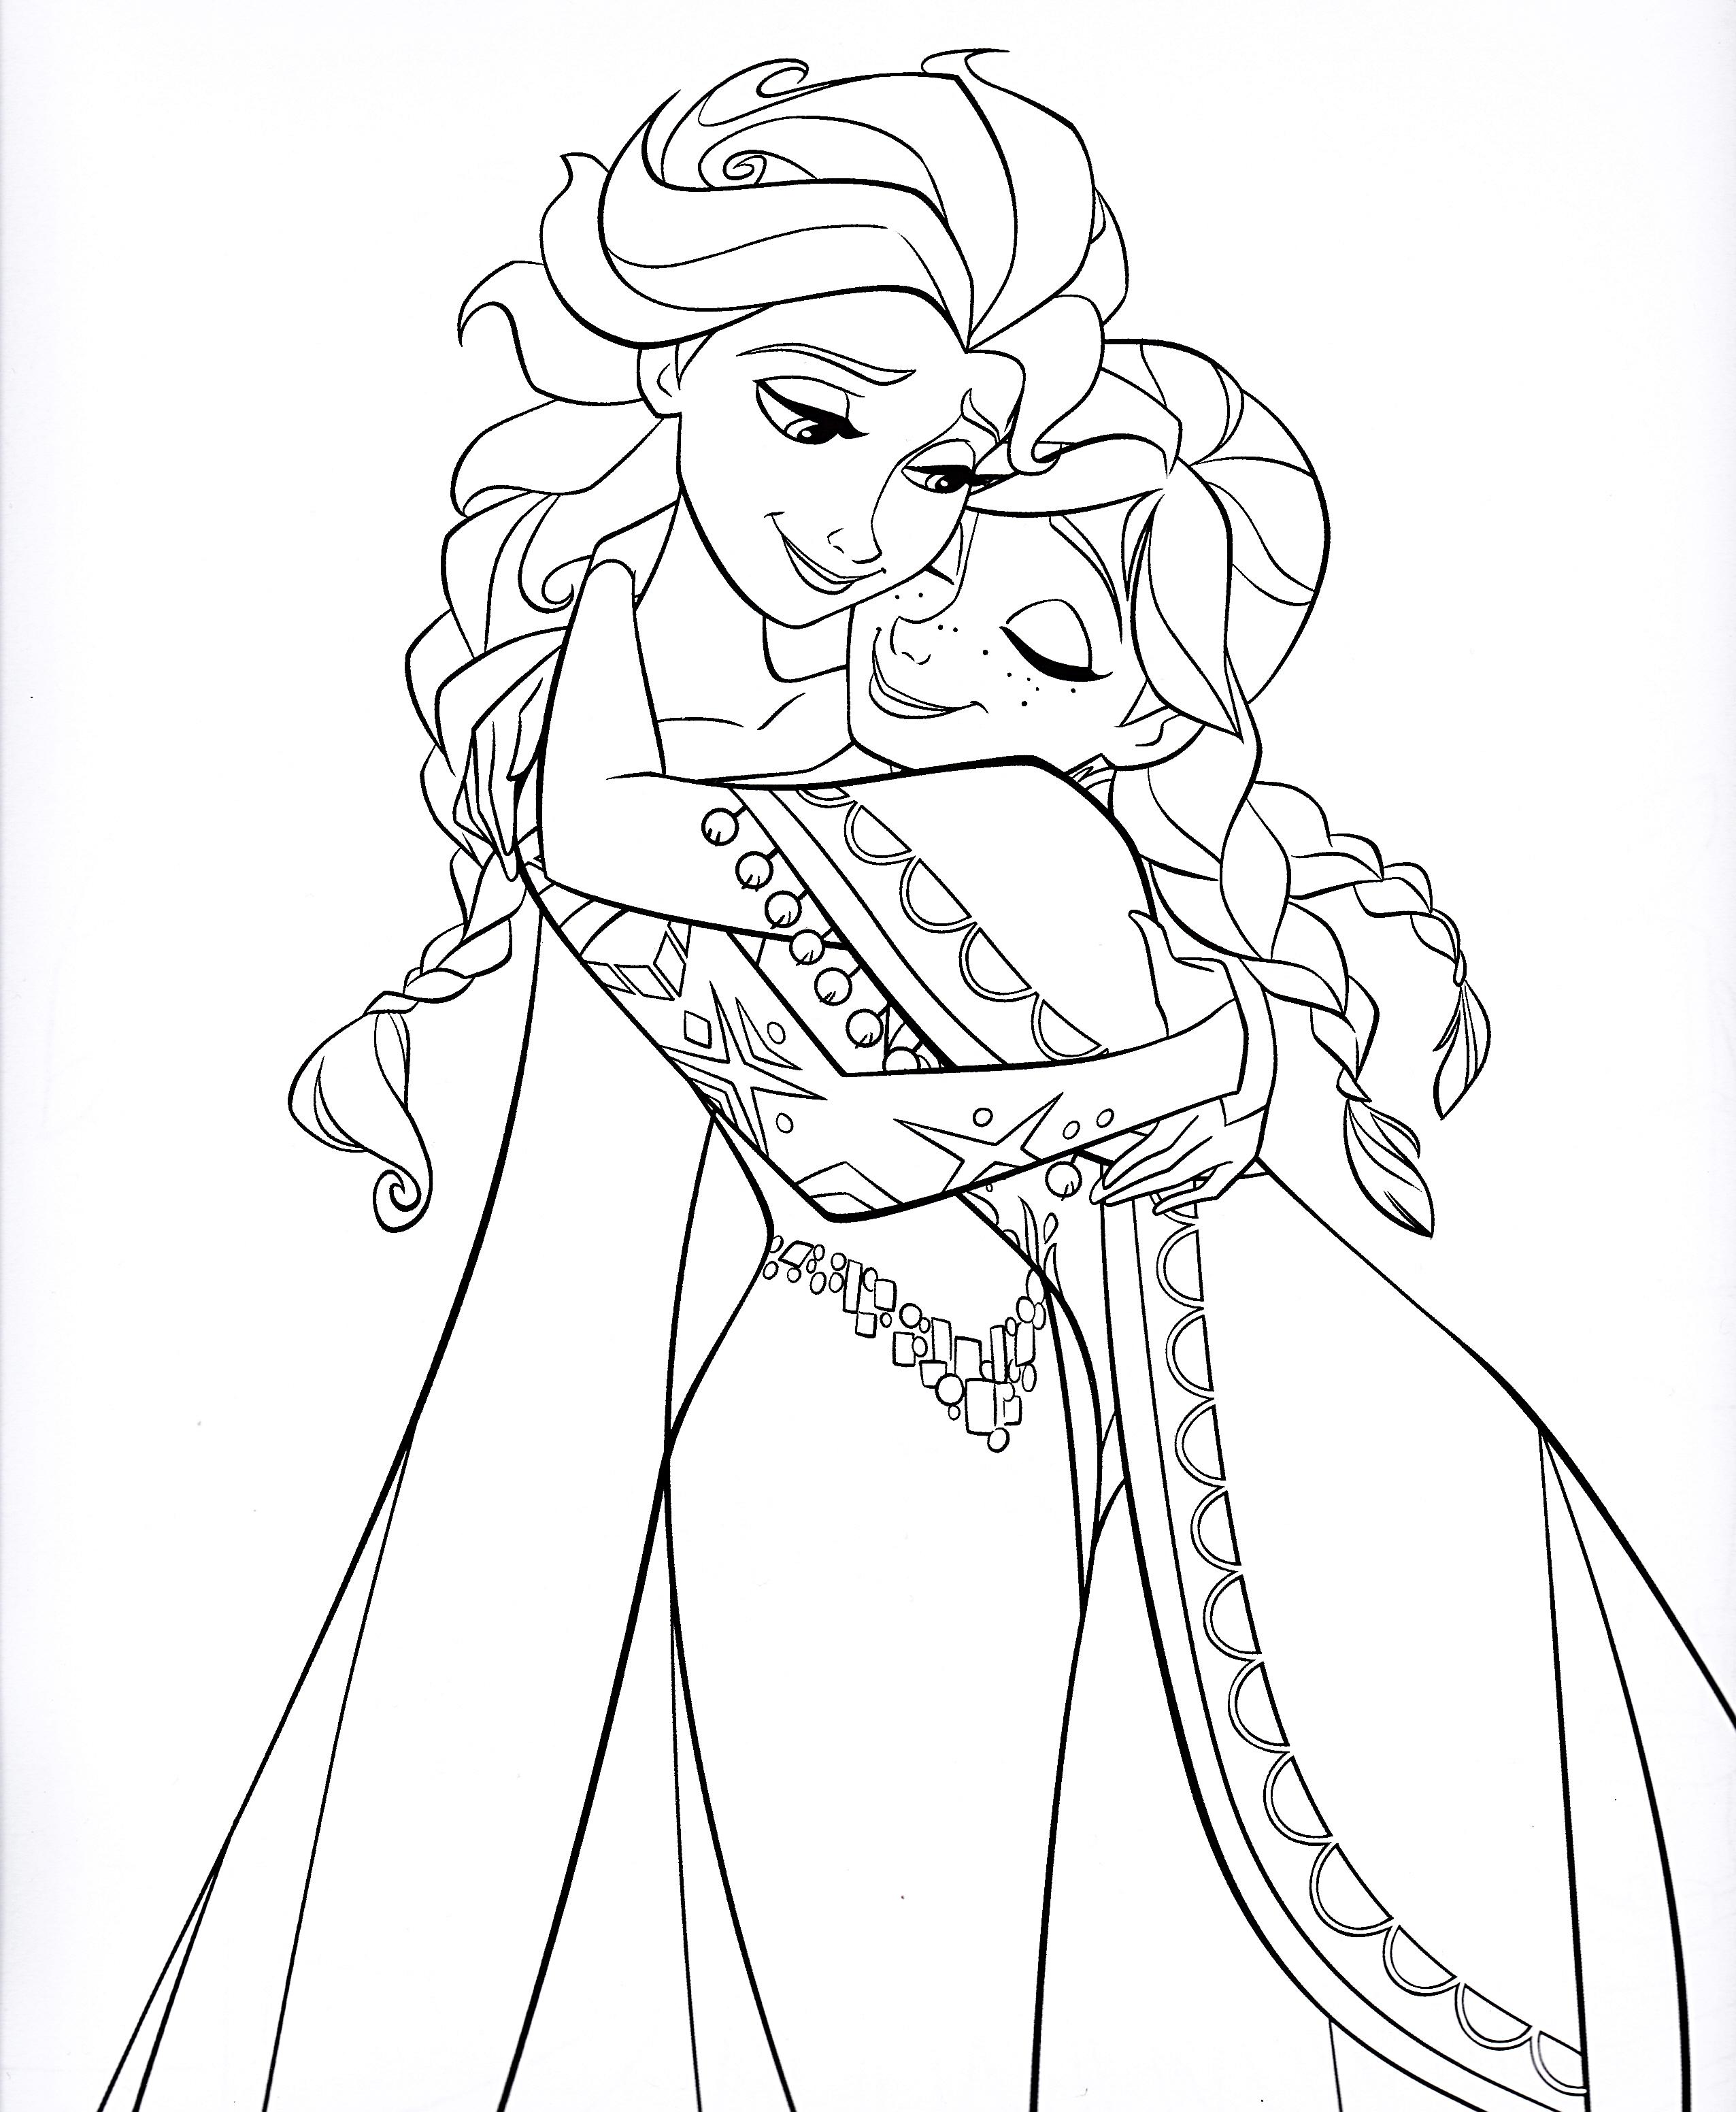 Disney Princess Elsa Coloring Pages At Getdrawings Com Free For